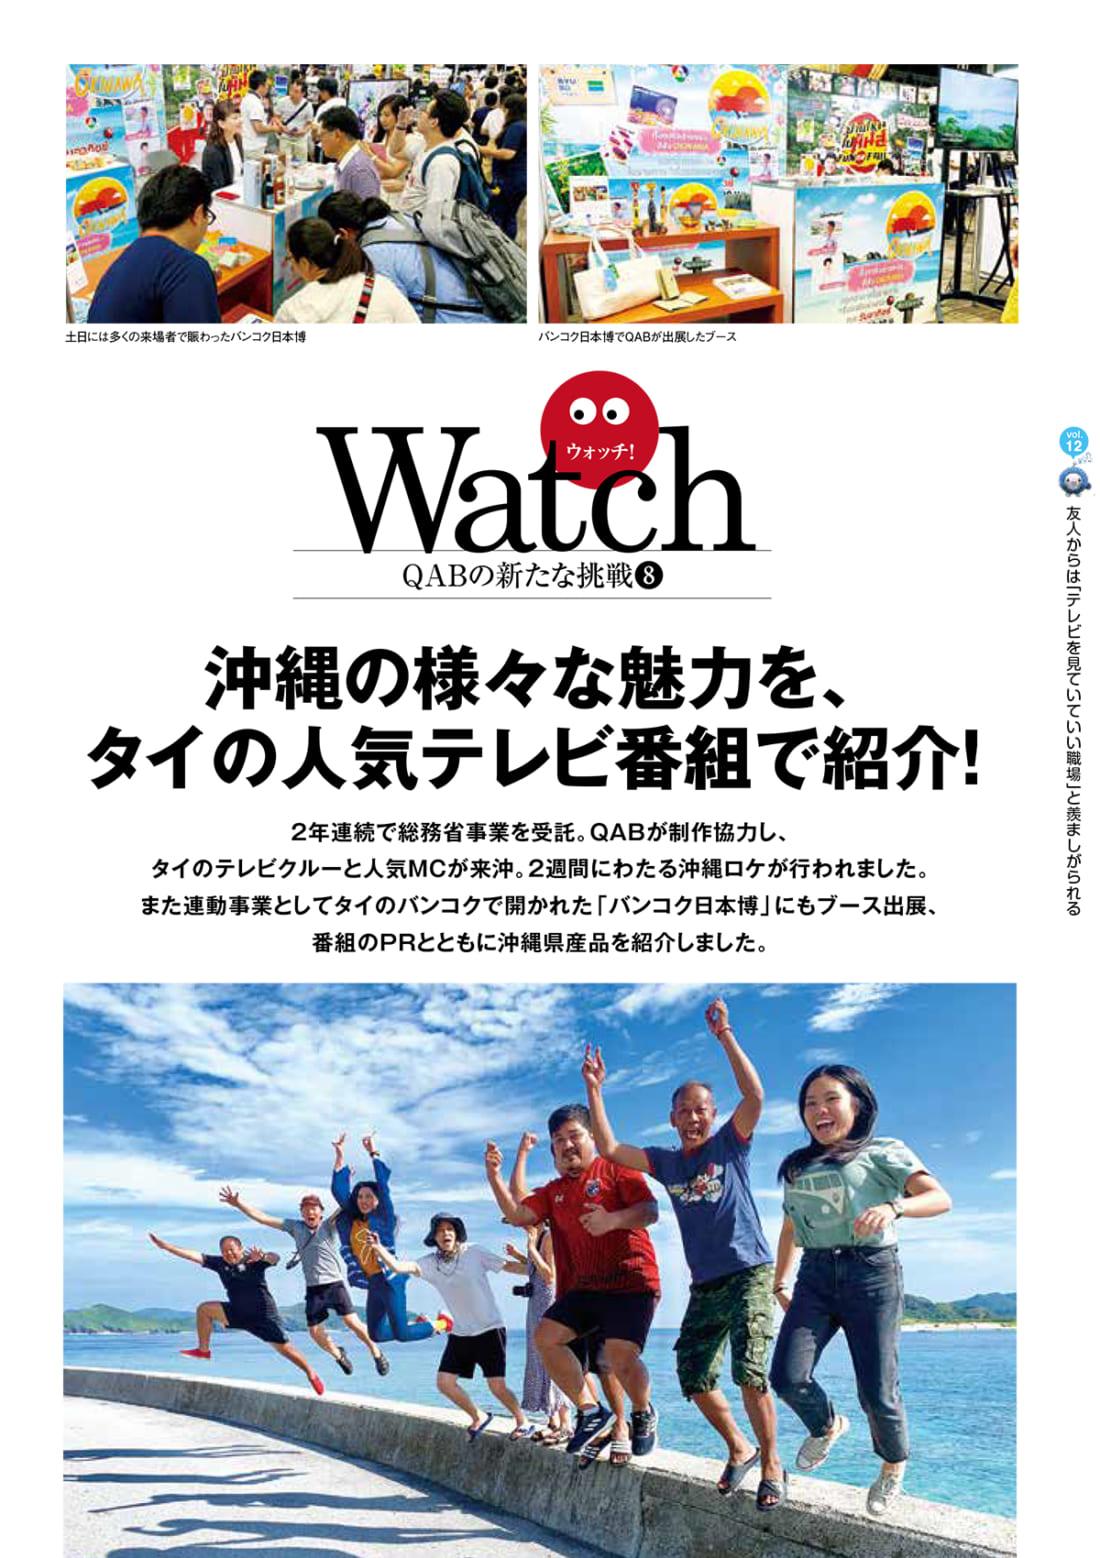 https://www.qab.co.jp/qgoro/wp-content/uploads/quun_1206-1100x1558.jpg